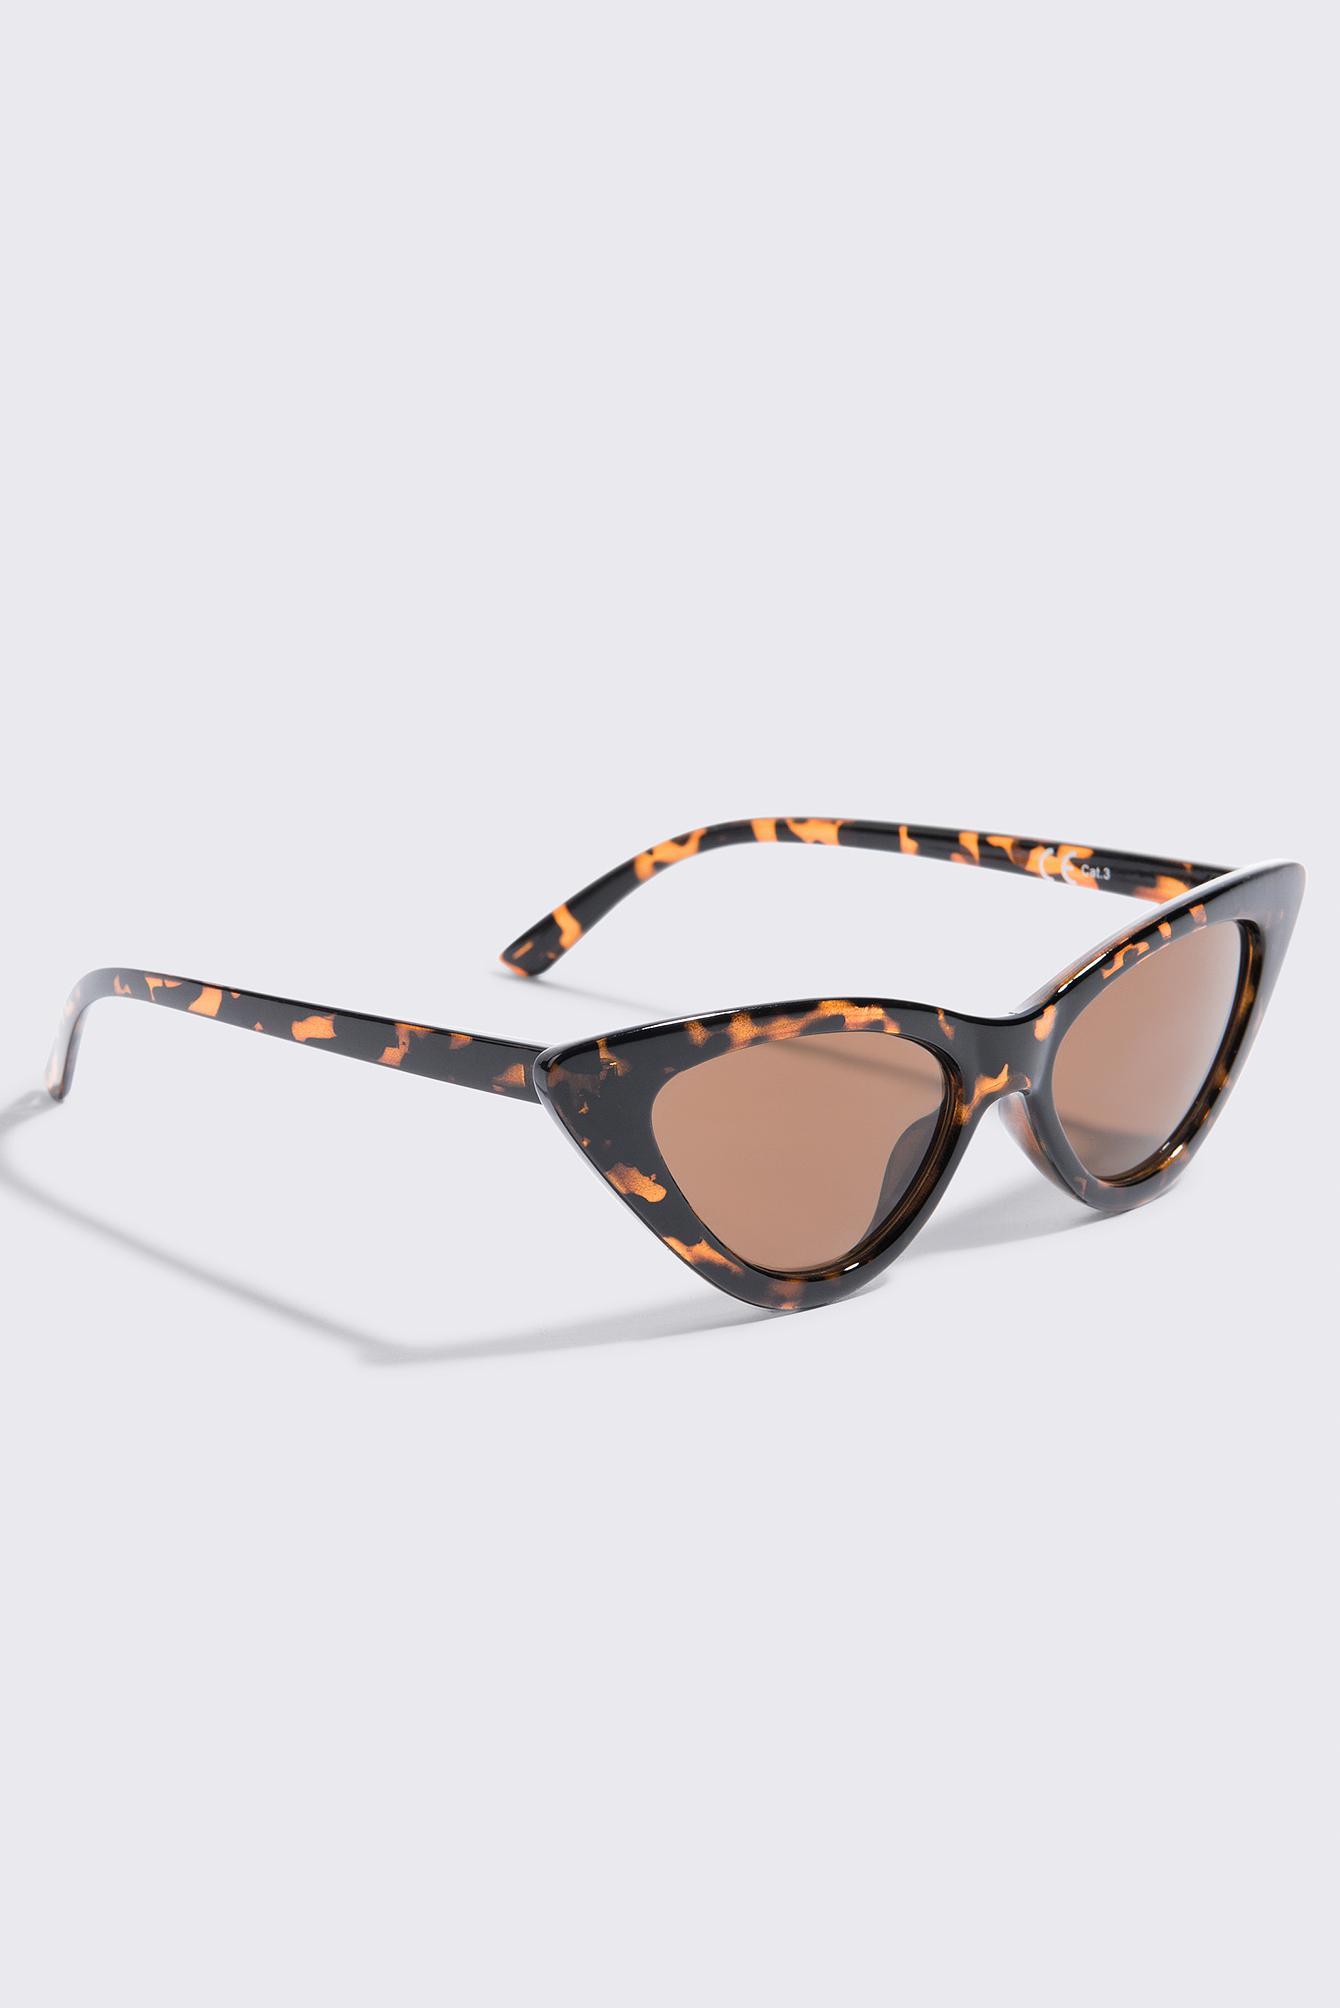 NA-KD Accessories Sharp Cat Eye Sunglasses - Brown 6MVZEb515G